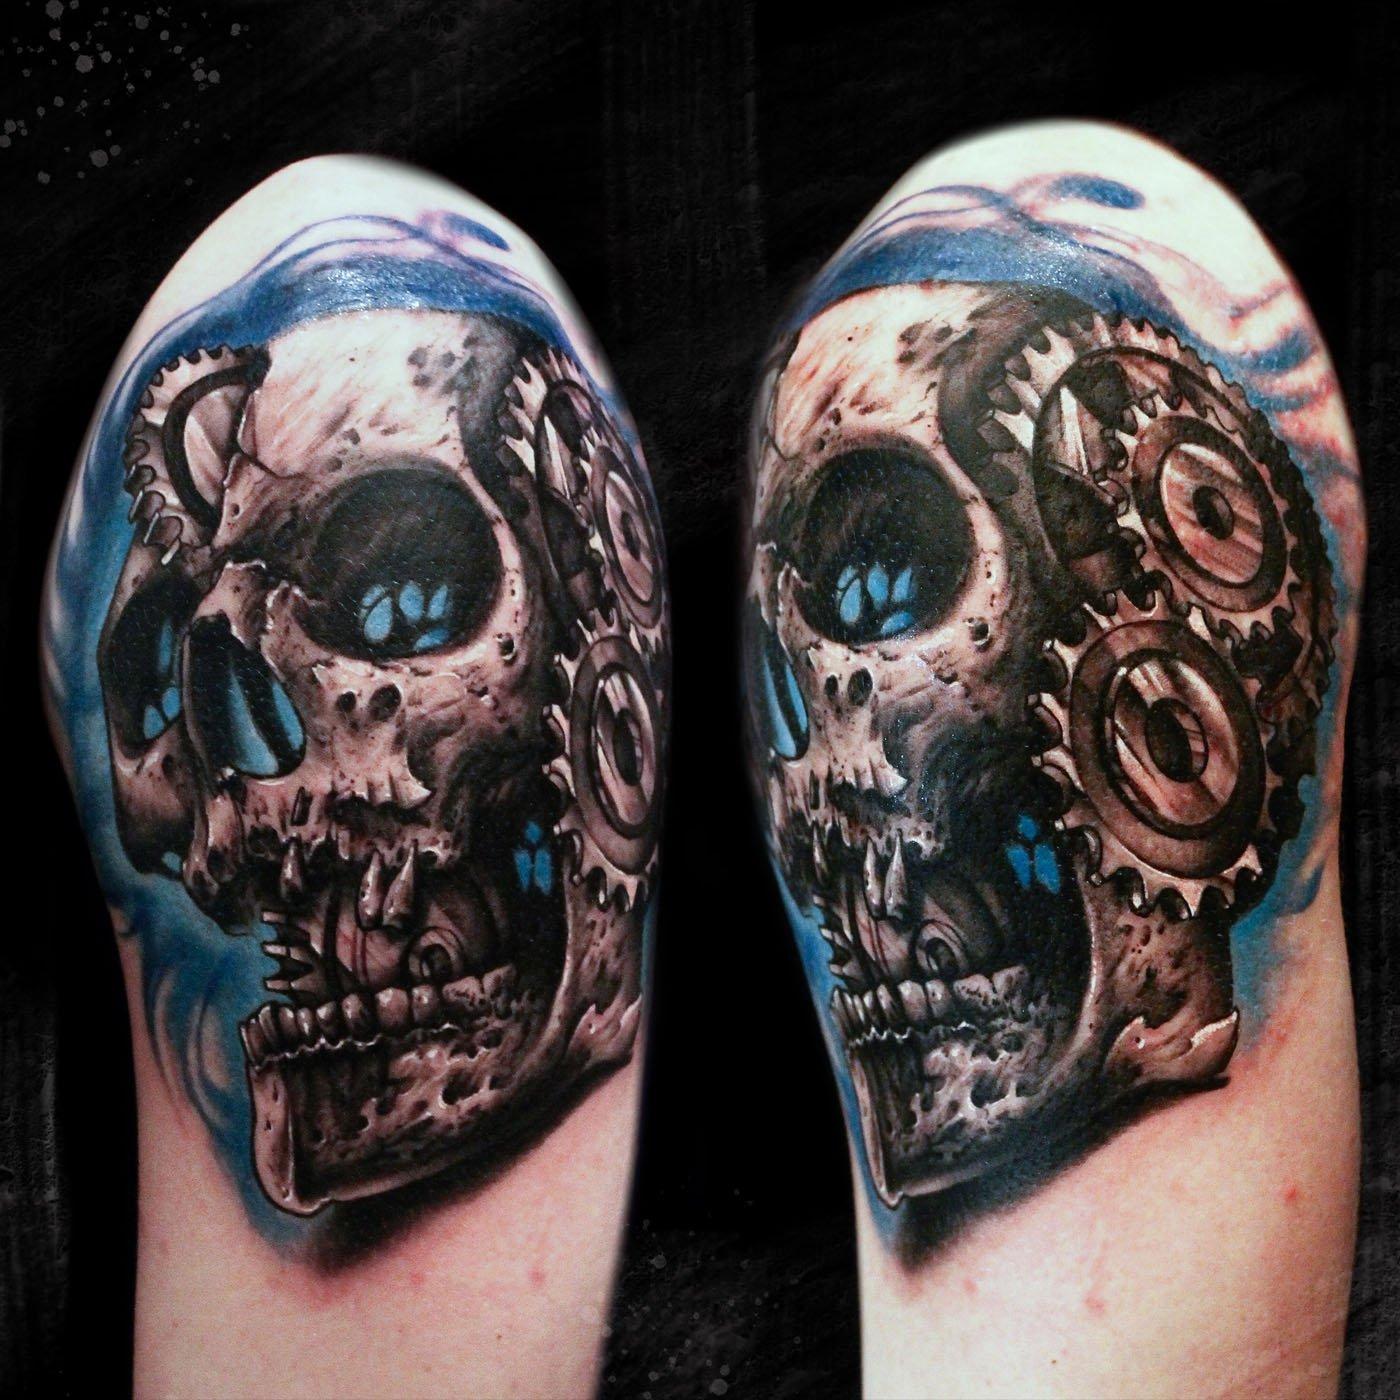 Calavera Con Engranajes Sick Nurse Tattoo By Rafa Garabal